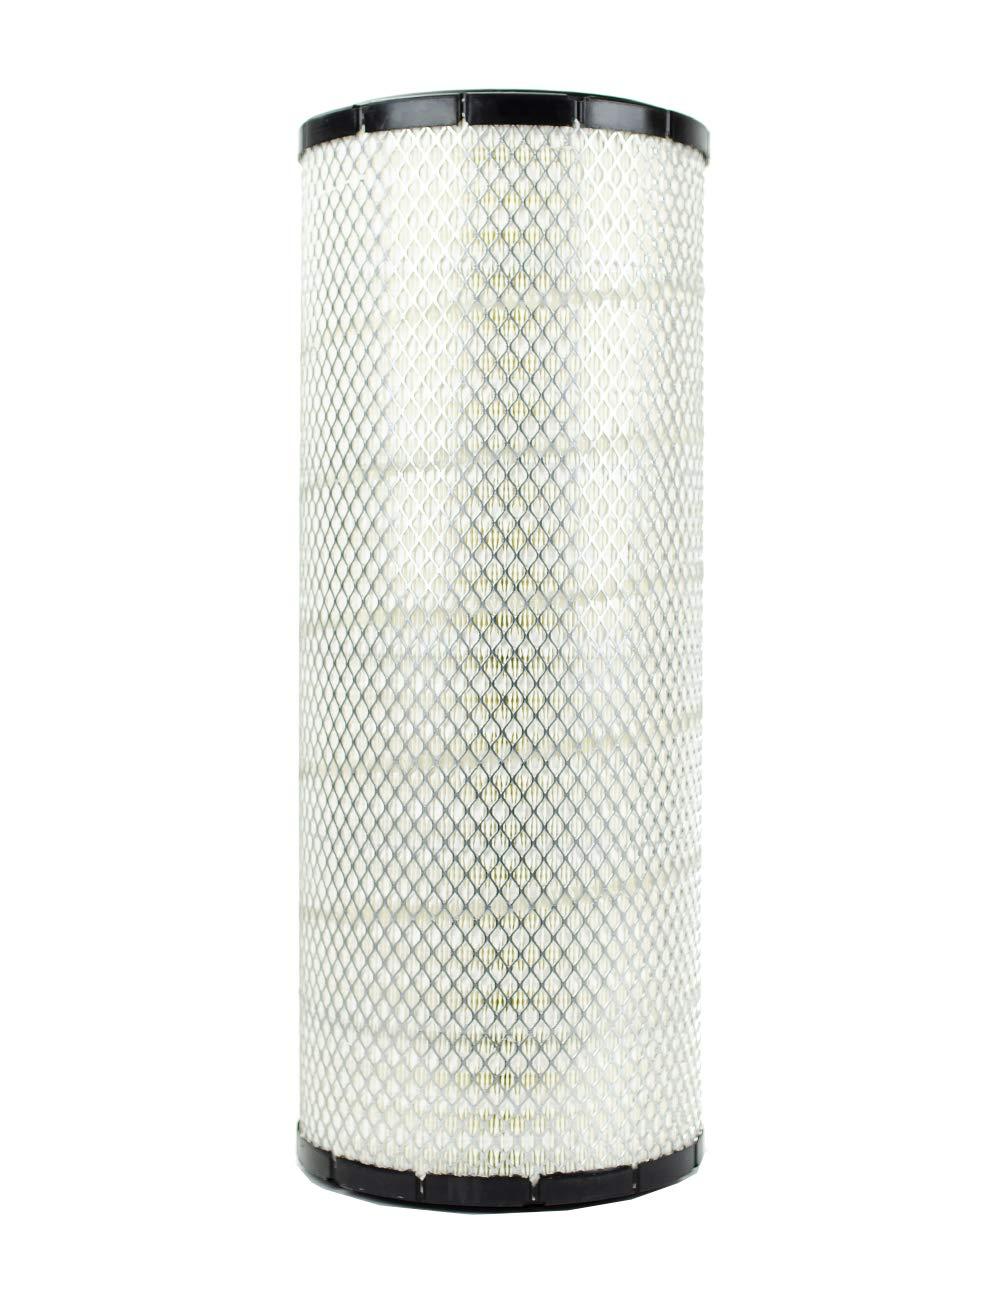 Houswin Semi Truck RS3516 Heavy Duty Air Filter by TRUCK FAIRINGS COM (Image #1)